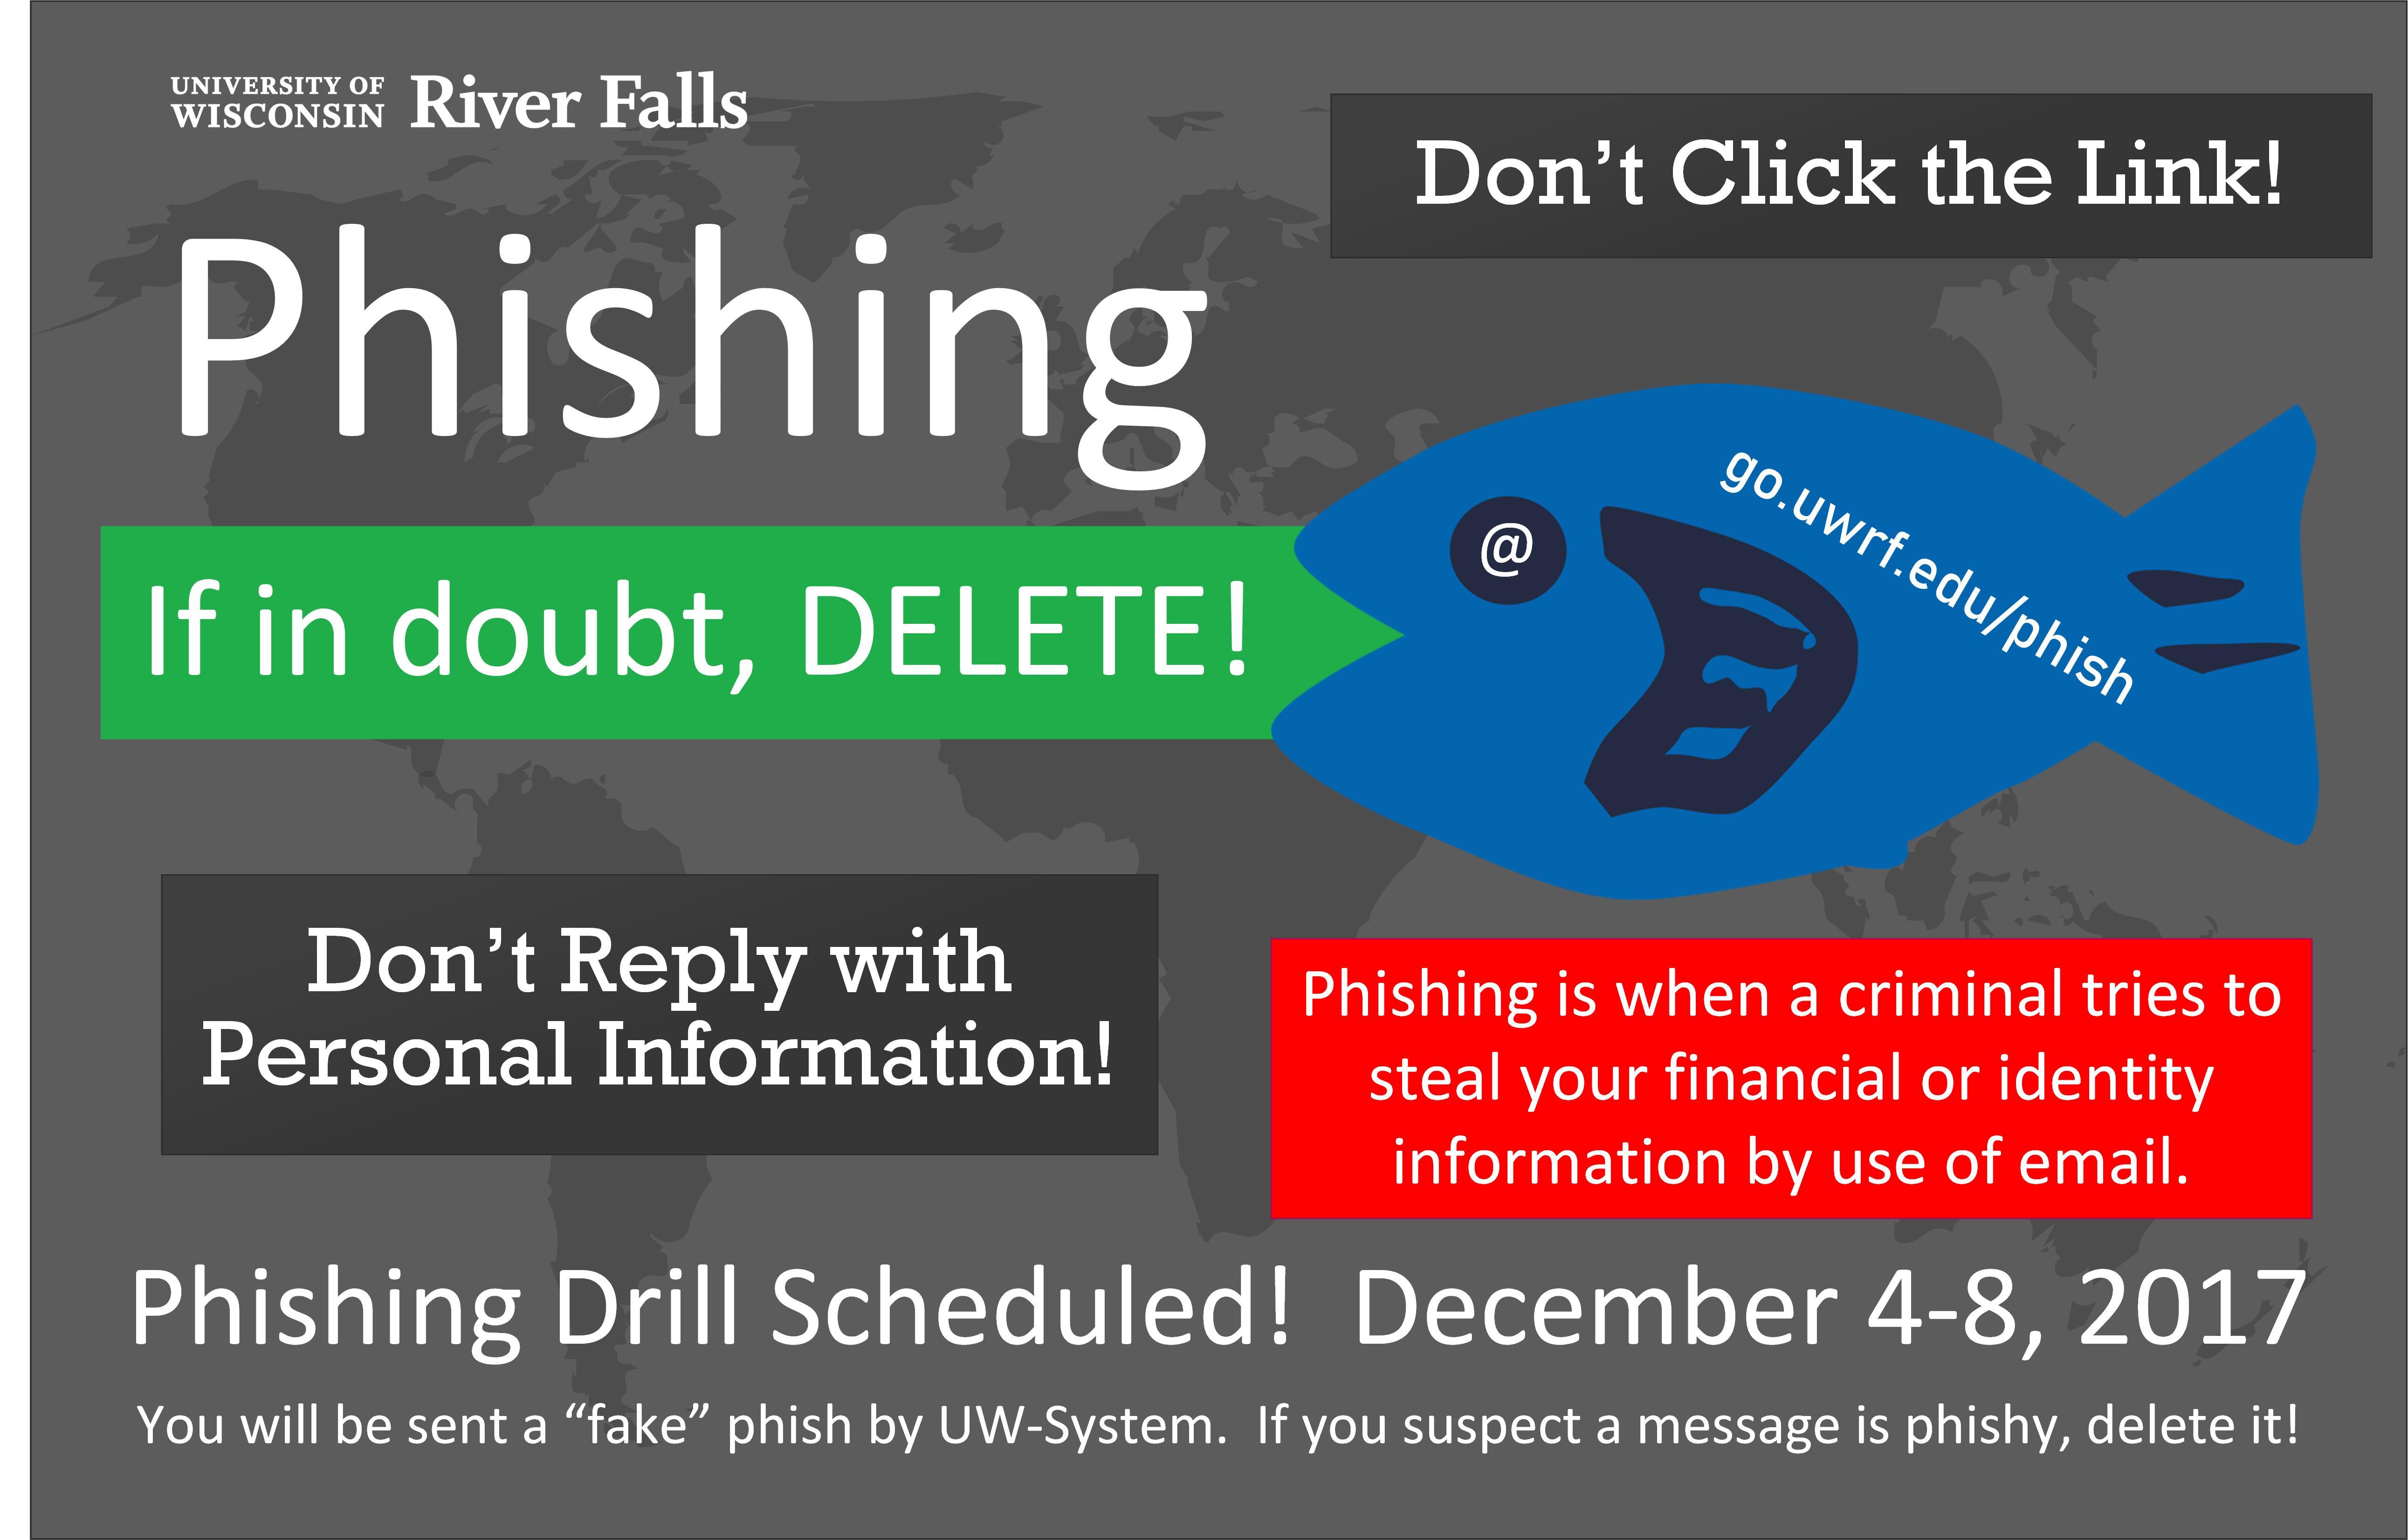 Phishing Drills Scheduled Dec 4-8, 2017